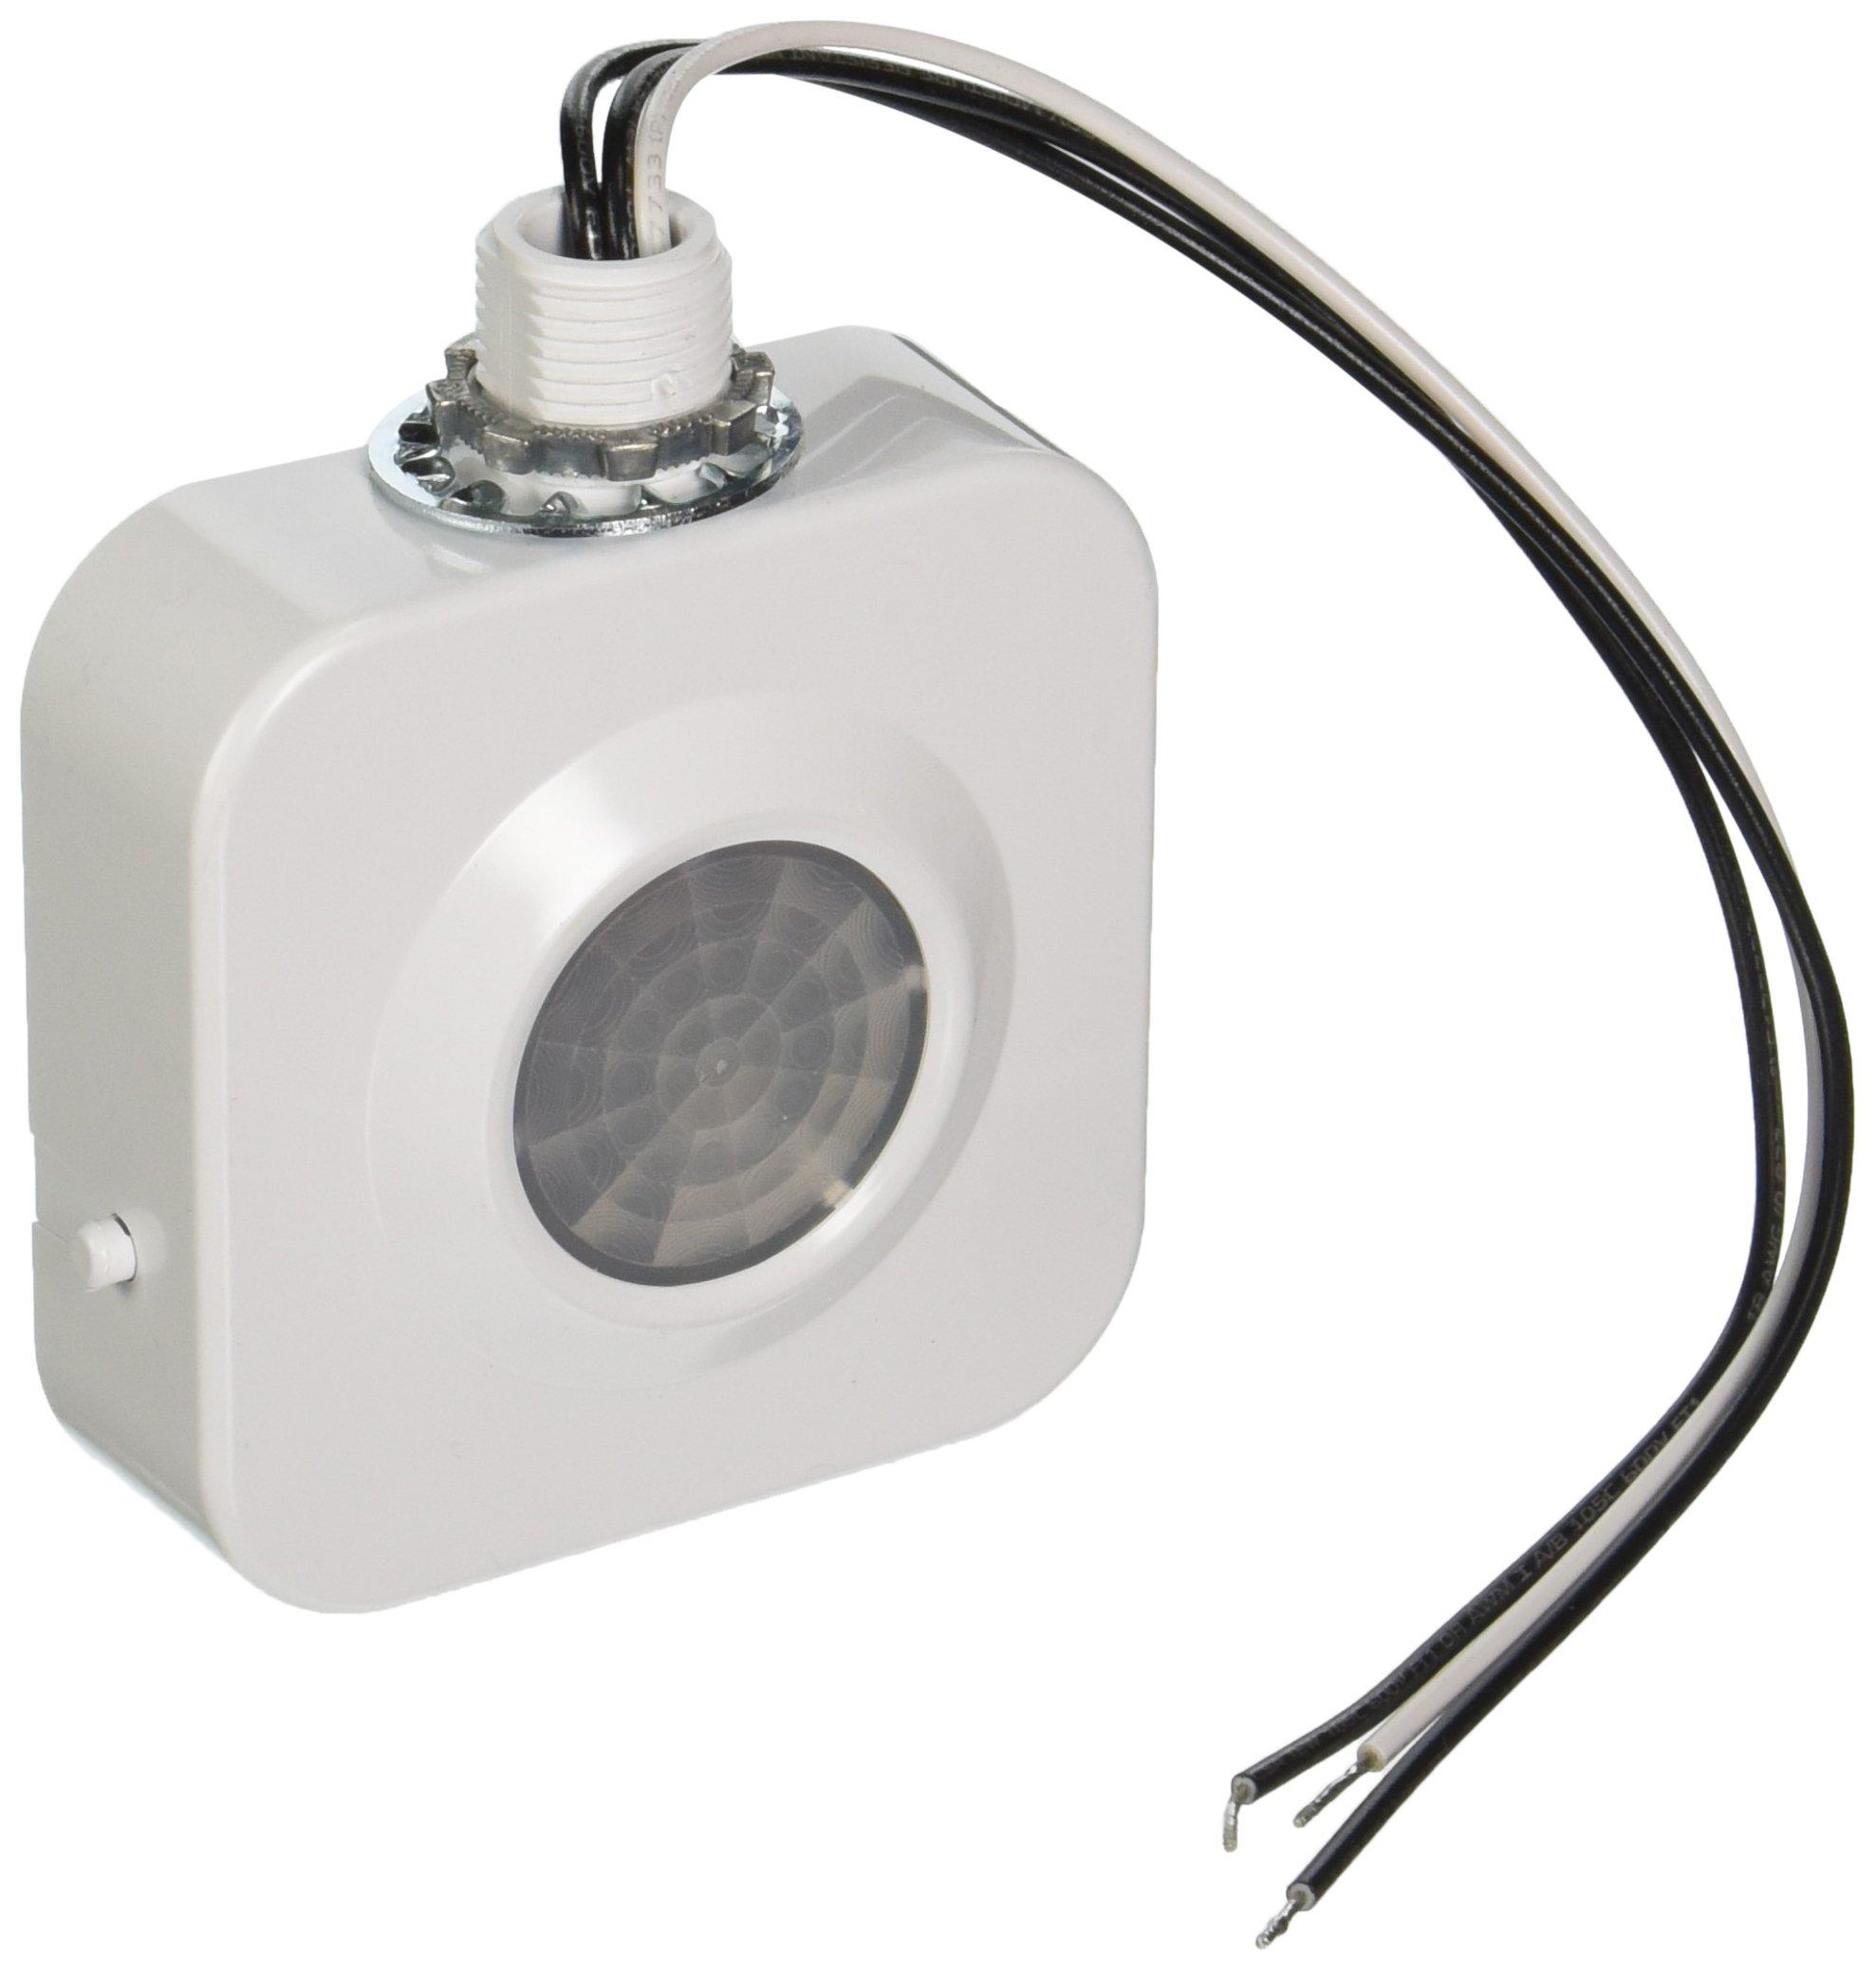 Sensor Switch CMRB 6 P PIR LineVage High Bay Aisle way with Photocell Fixture Mount Sensor by Sensor Switch